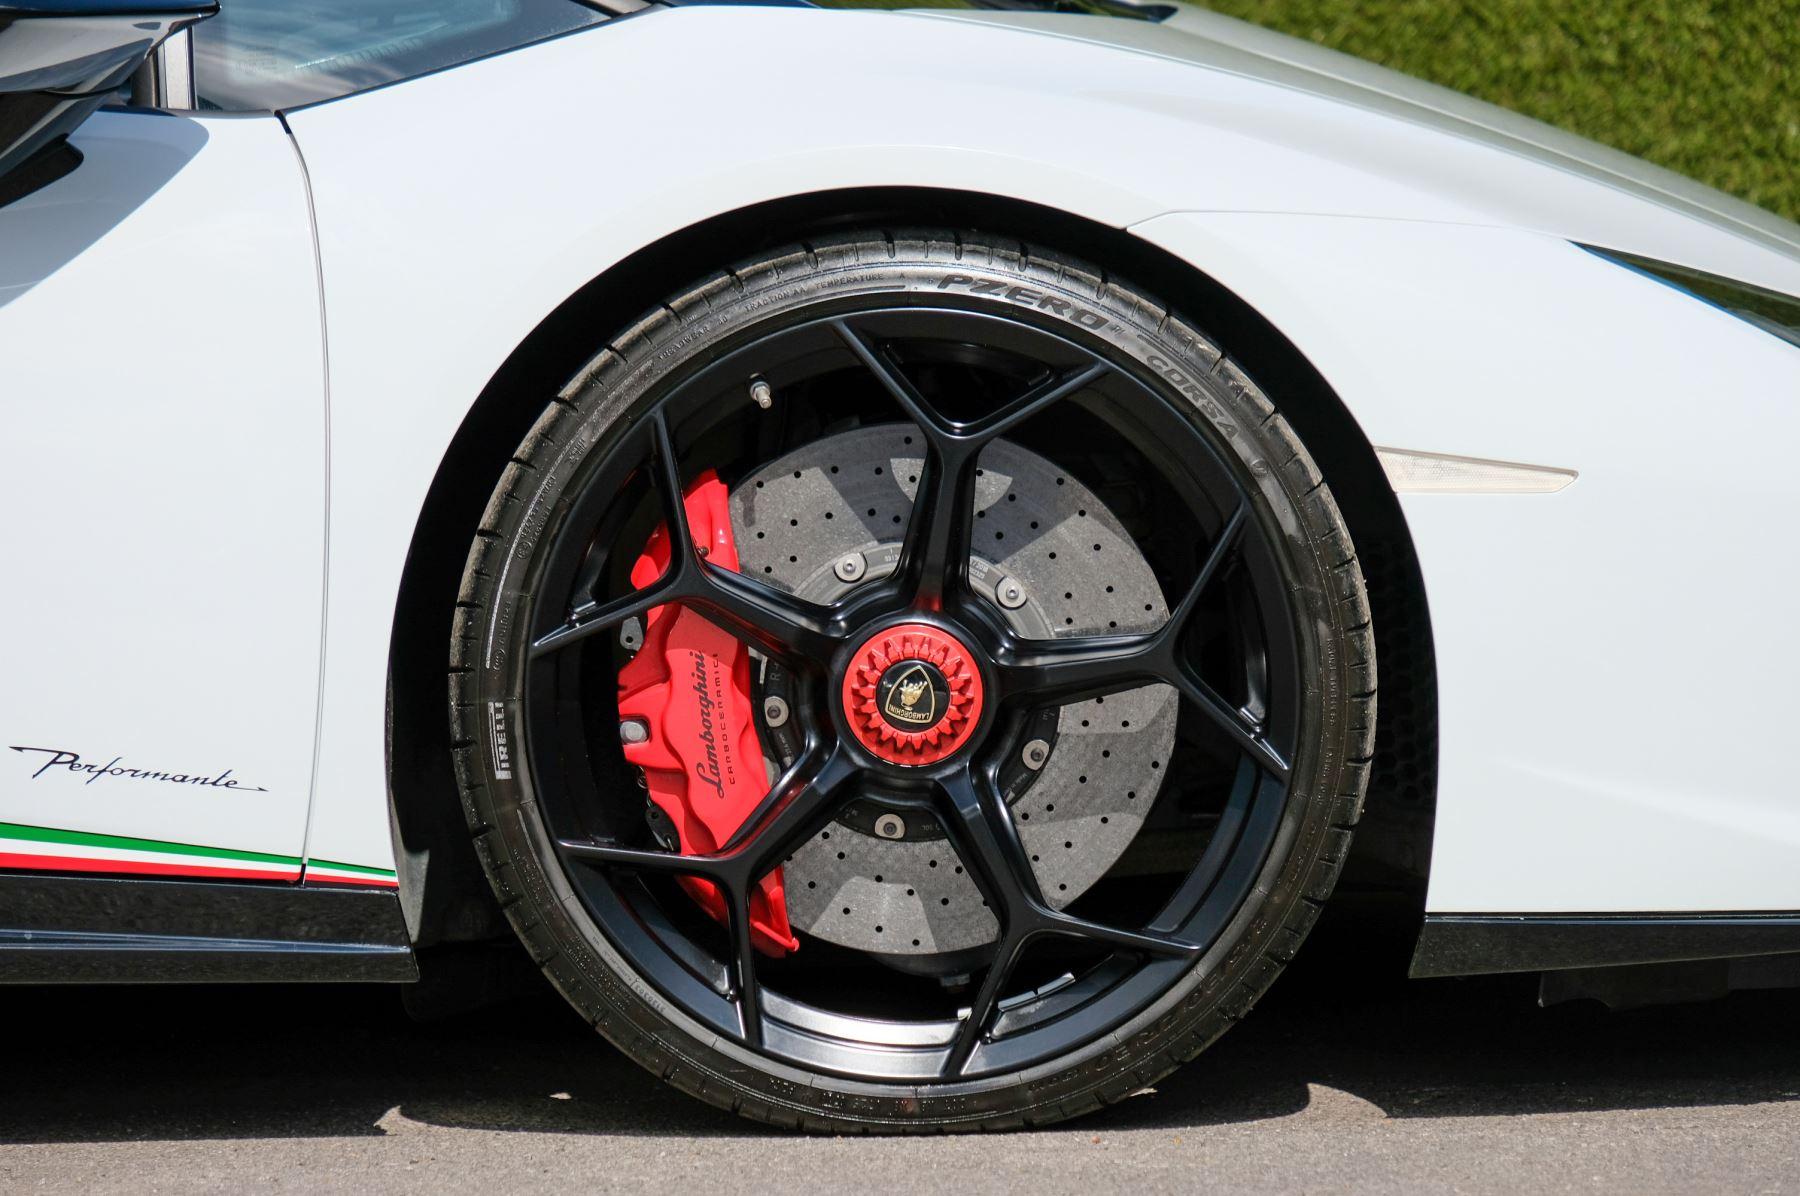 Lamborghini Huracan Performante Spyder 5.2 V10 AWD image 9